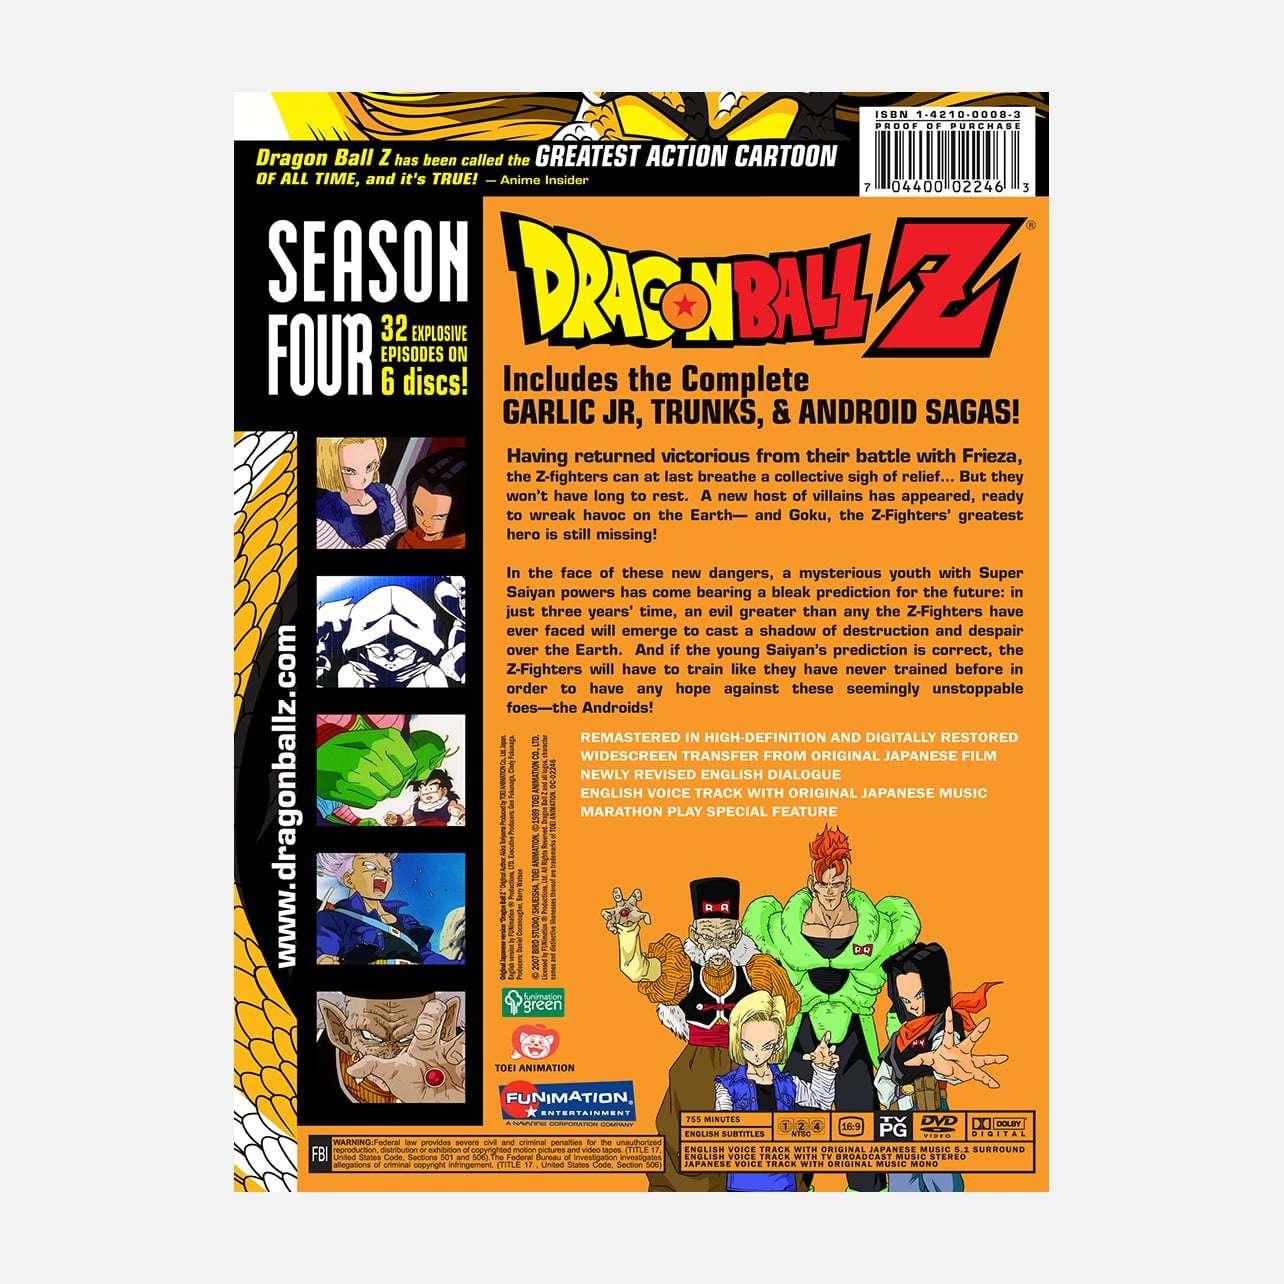 Dragon Ball Z (TV Series 1996–2003) - IMDb